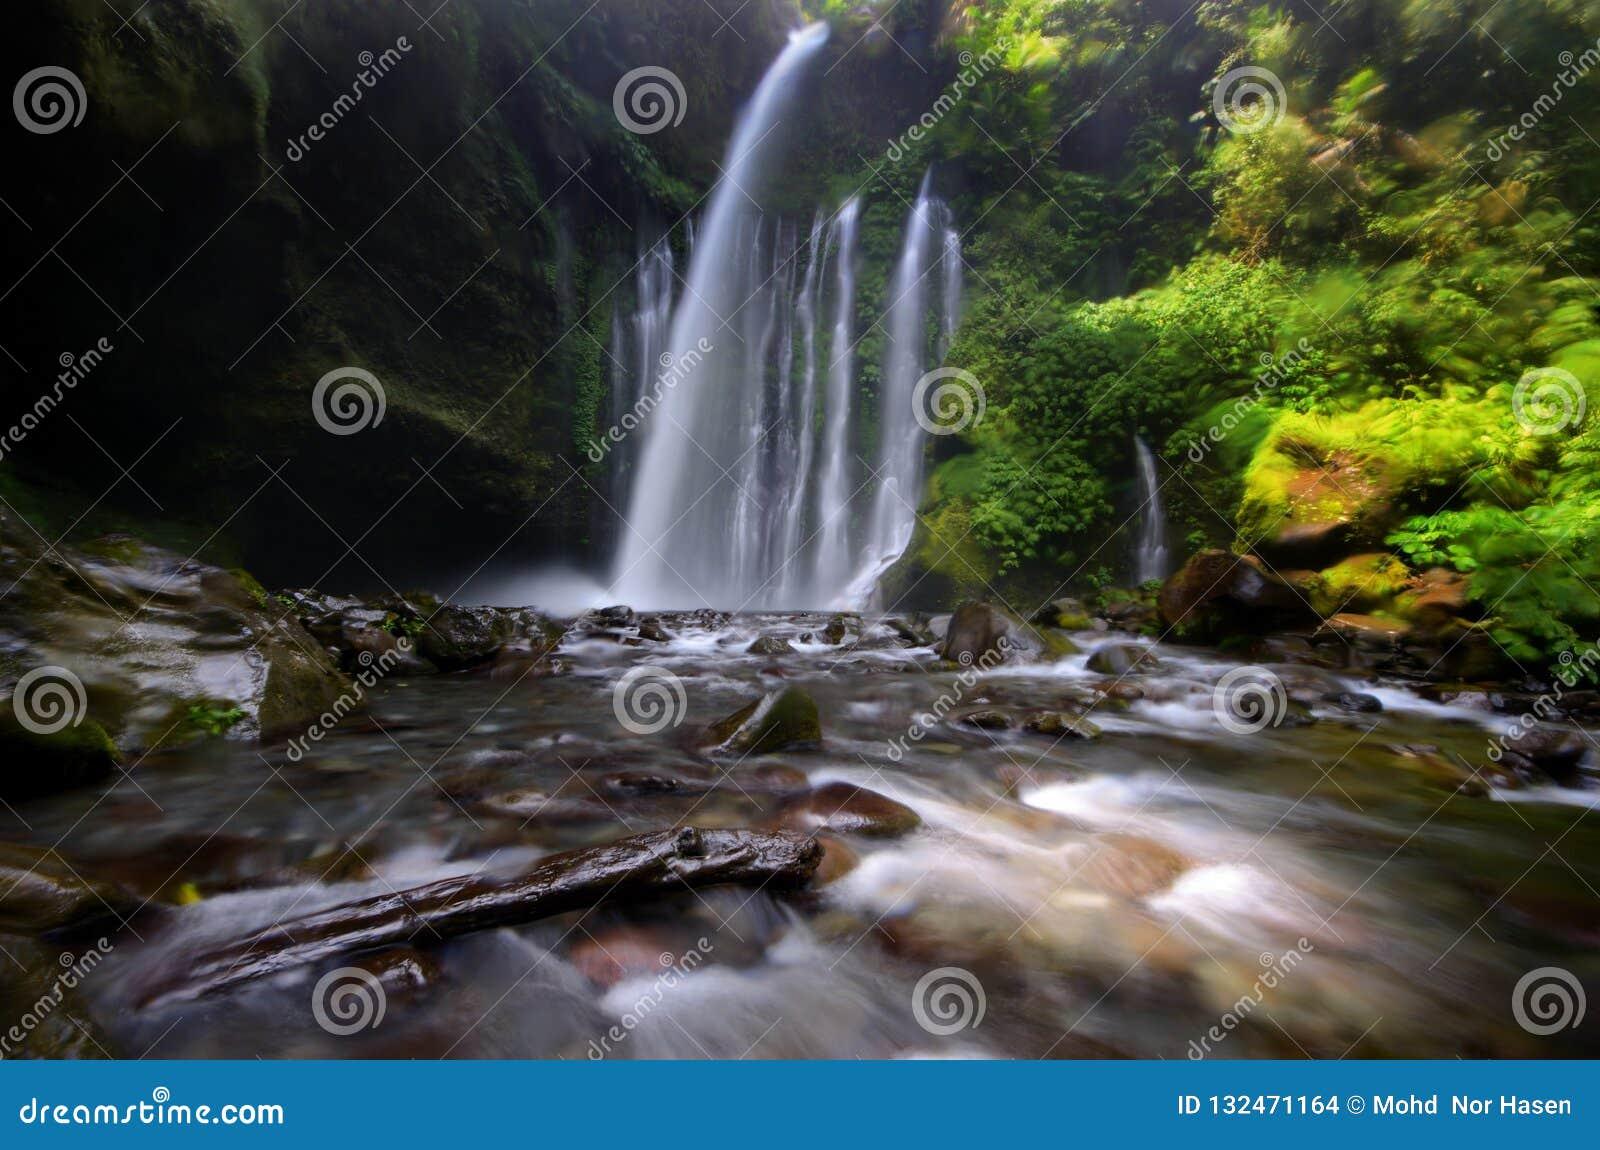 Tiu Kelep Waterfall near Rinjani, Senaru Lombok indonesia. Southeast Asia. Motion blur and soft focus due to Long Exposure Shot.